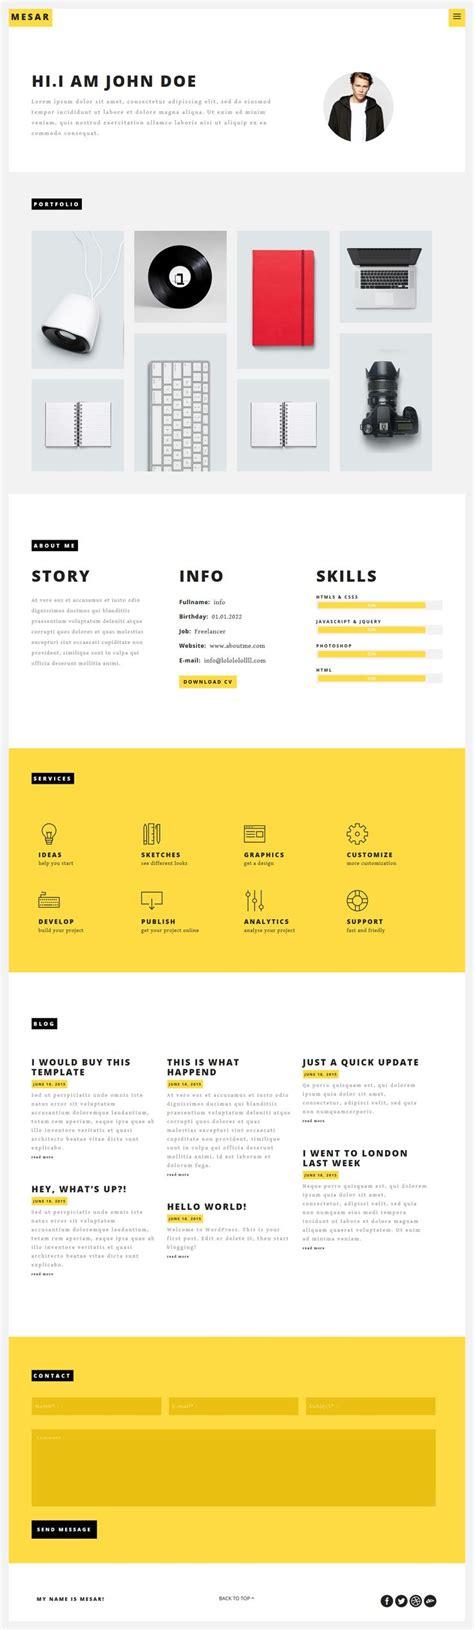 wordpress archive layout best 25 archive website ideas on pinterest statement of